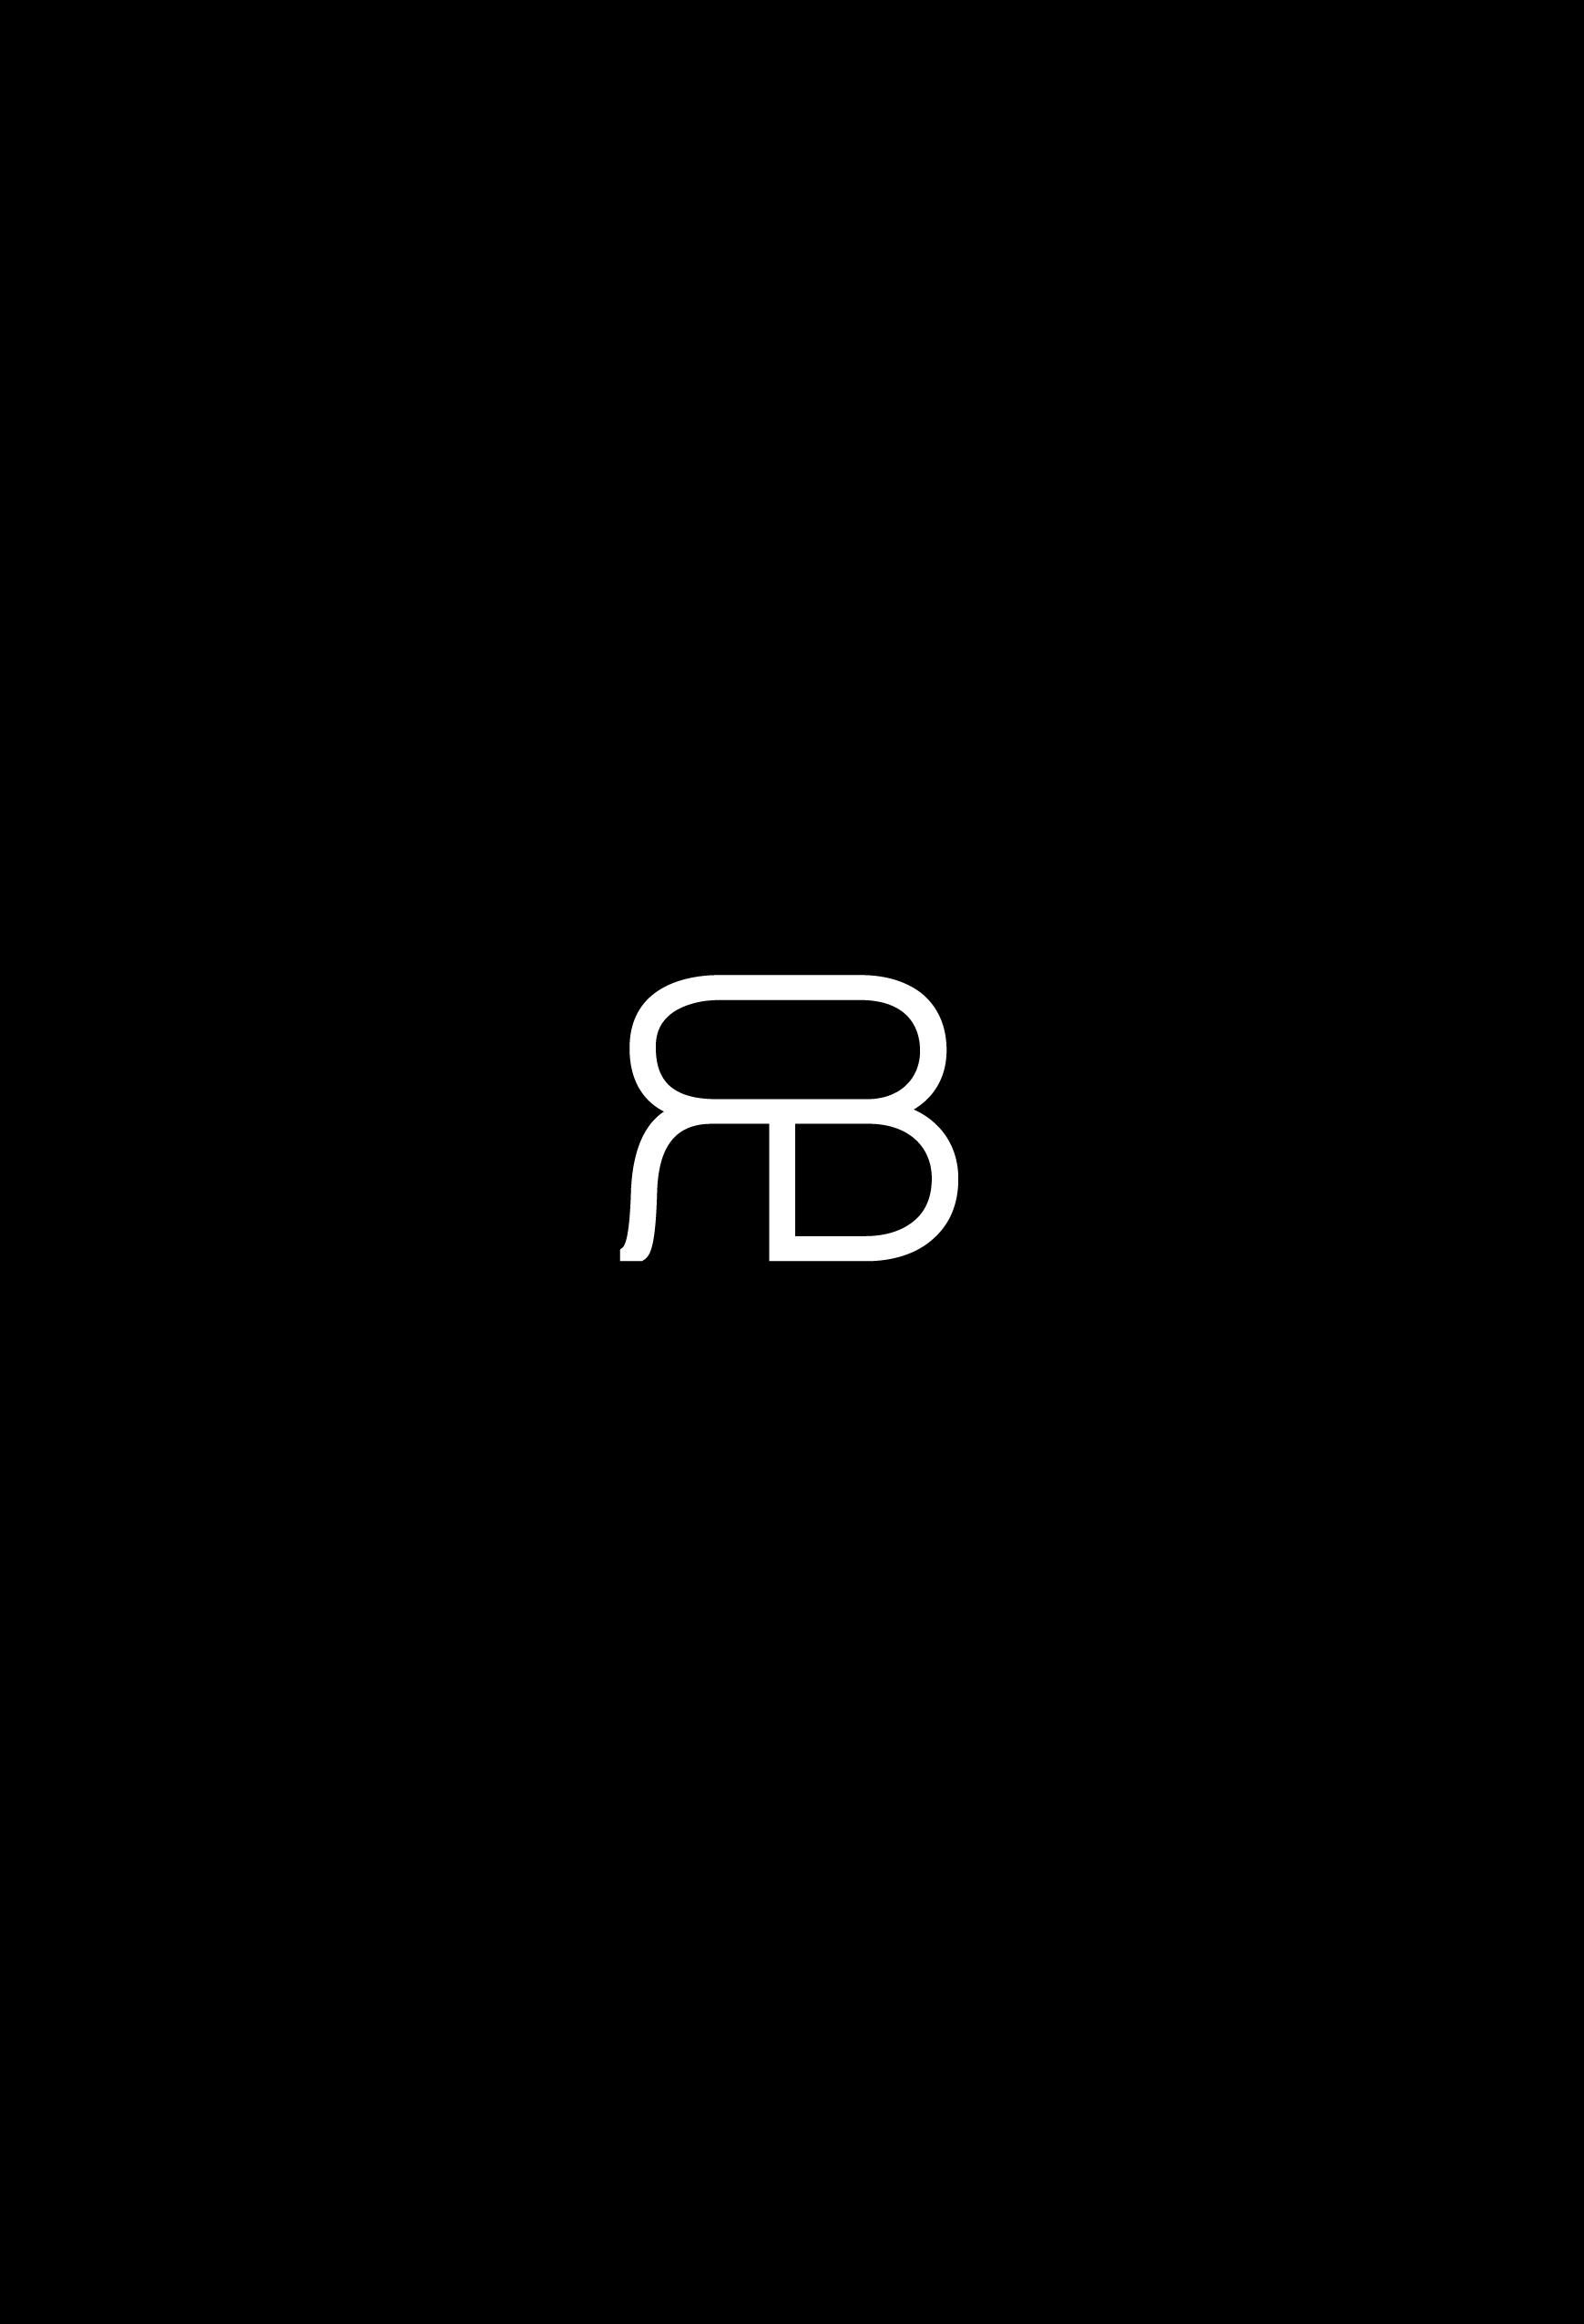 raluca buzura monogram white on black